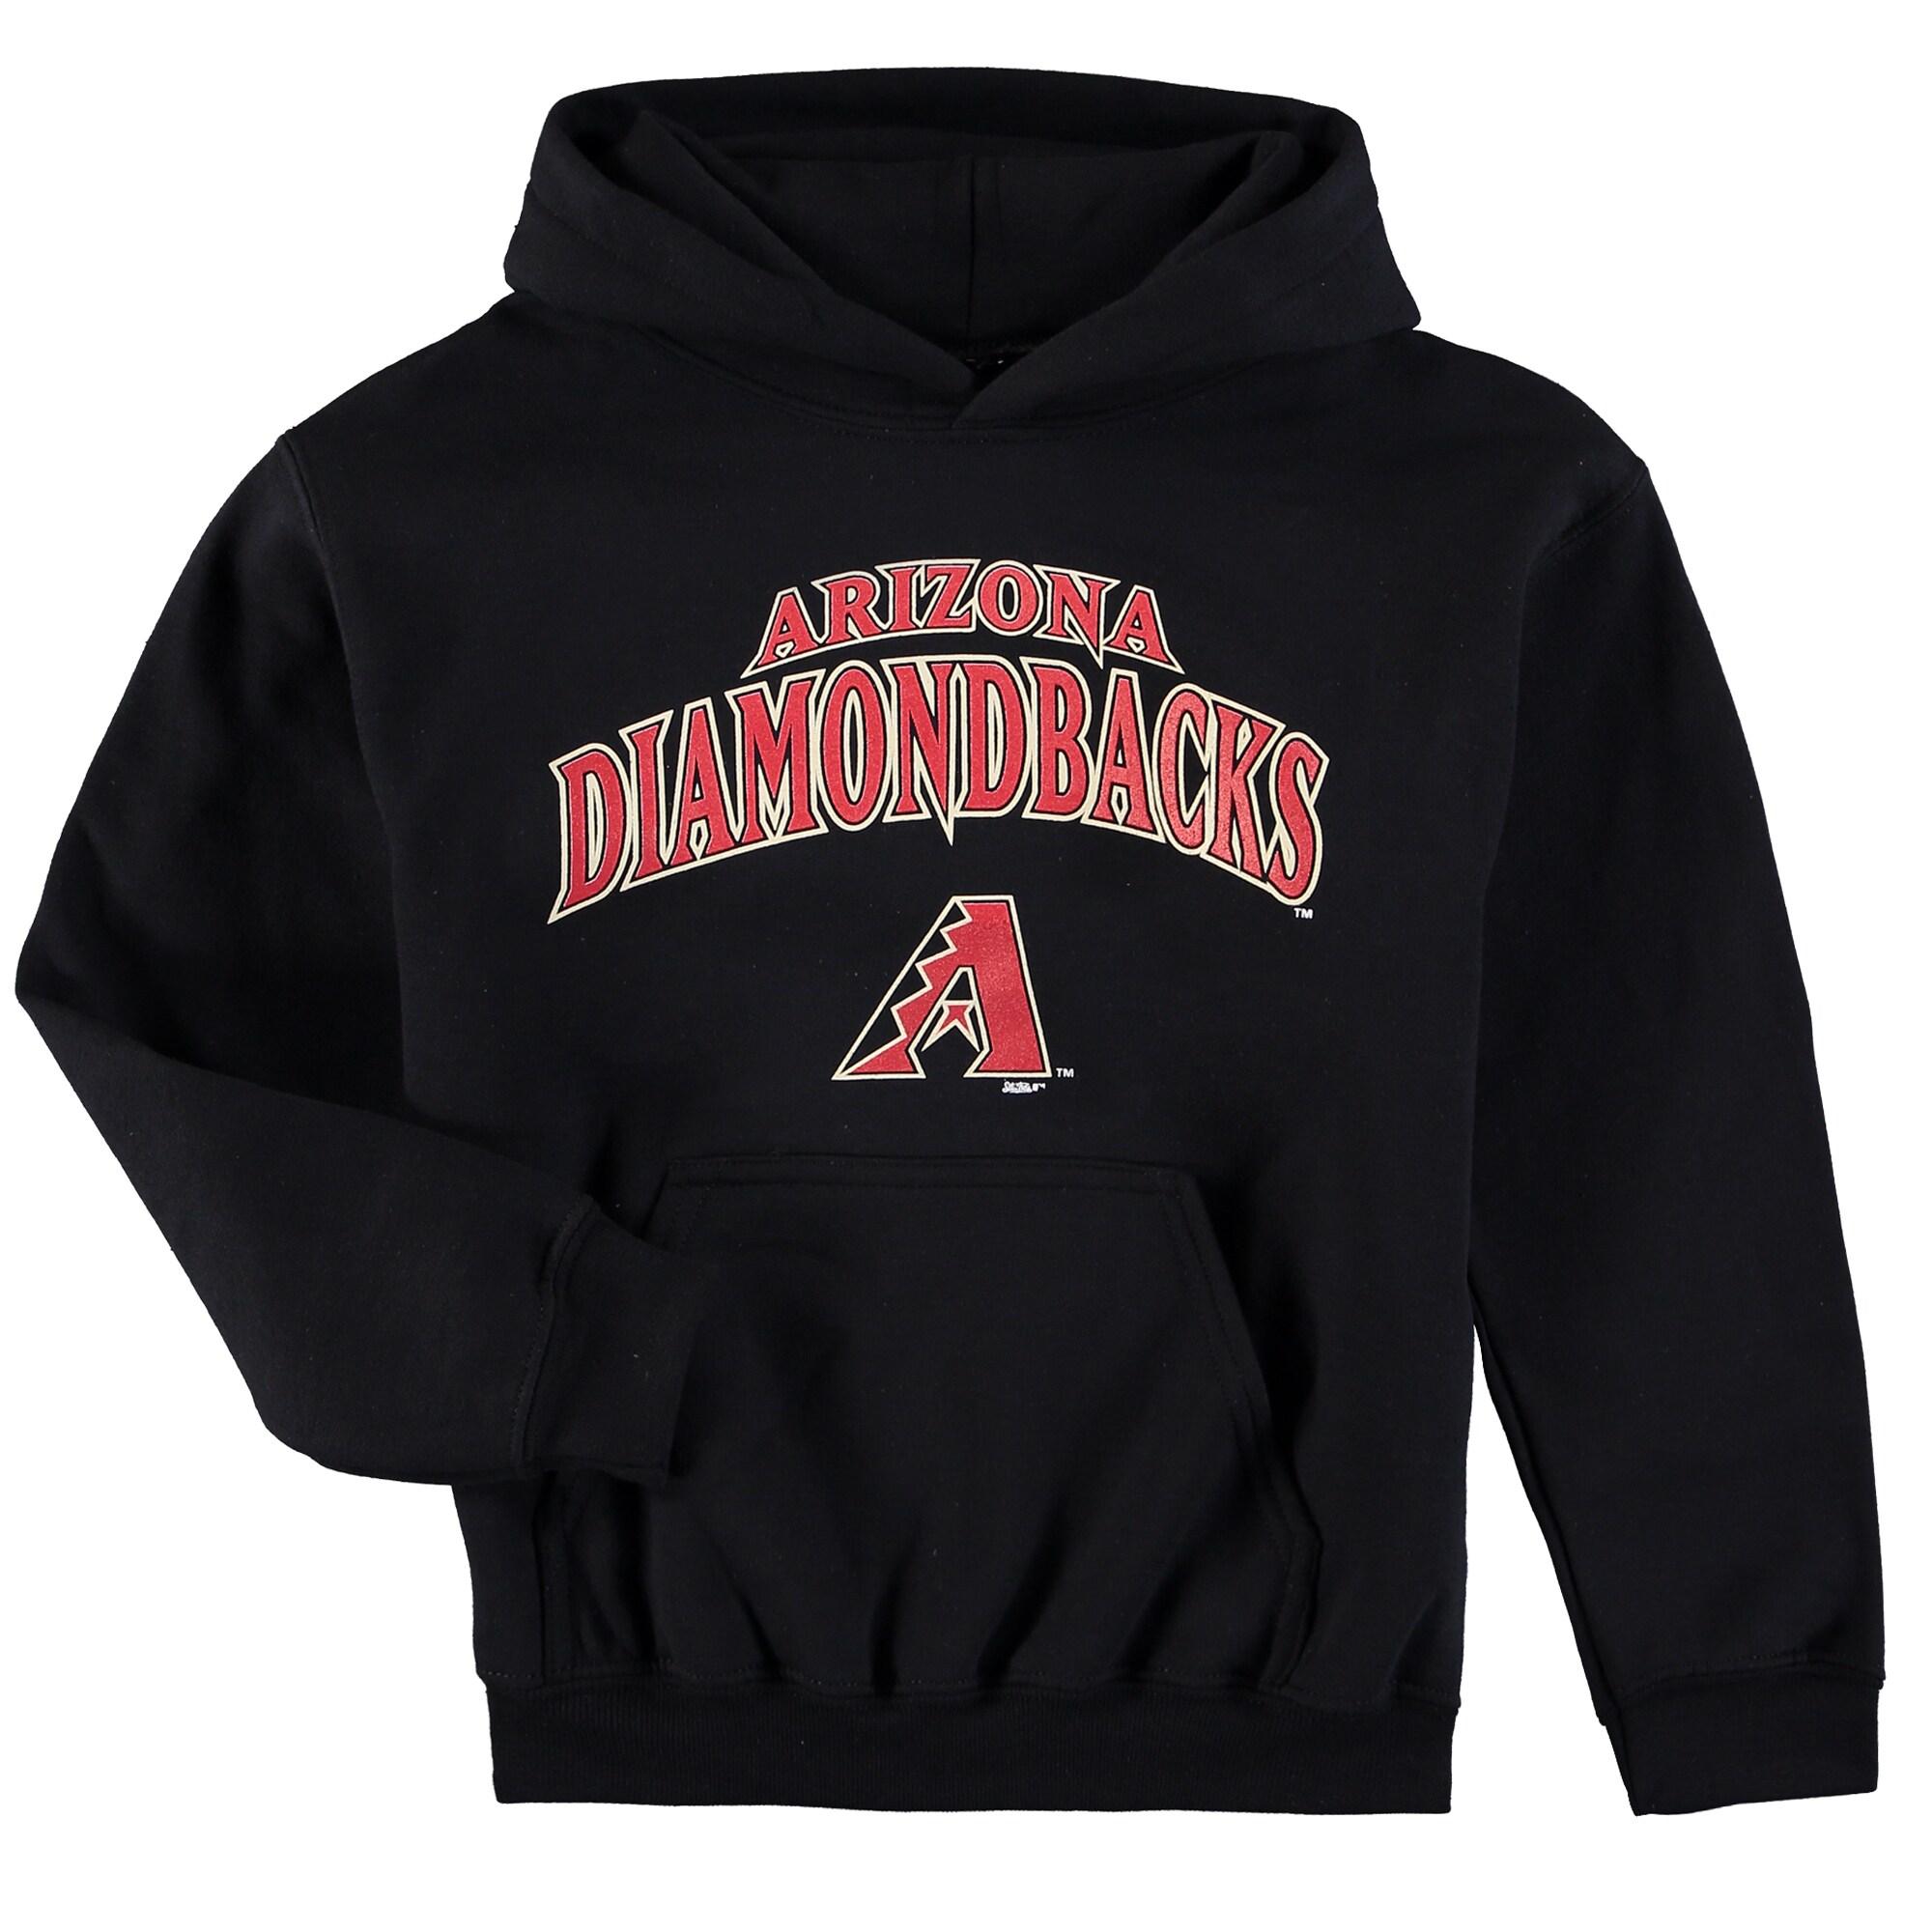 Arizona Diamondbacks Stitches Youth Team Fleece Pullover Hoodie - Black